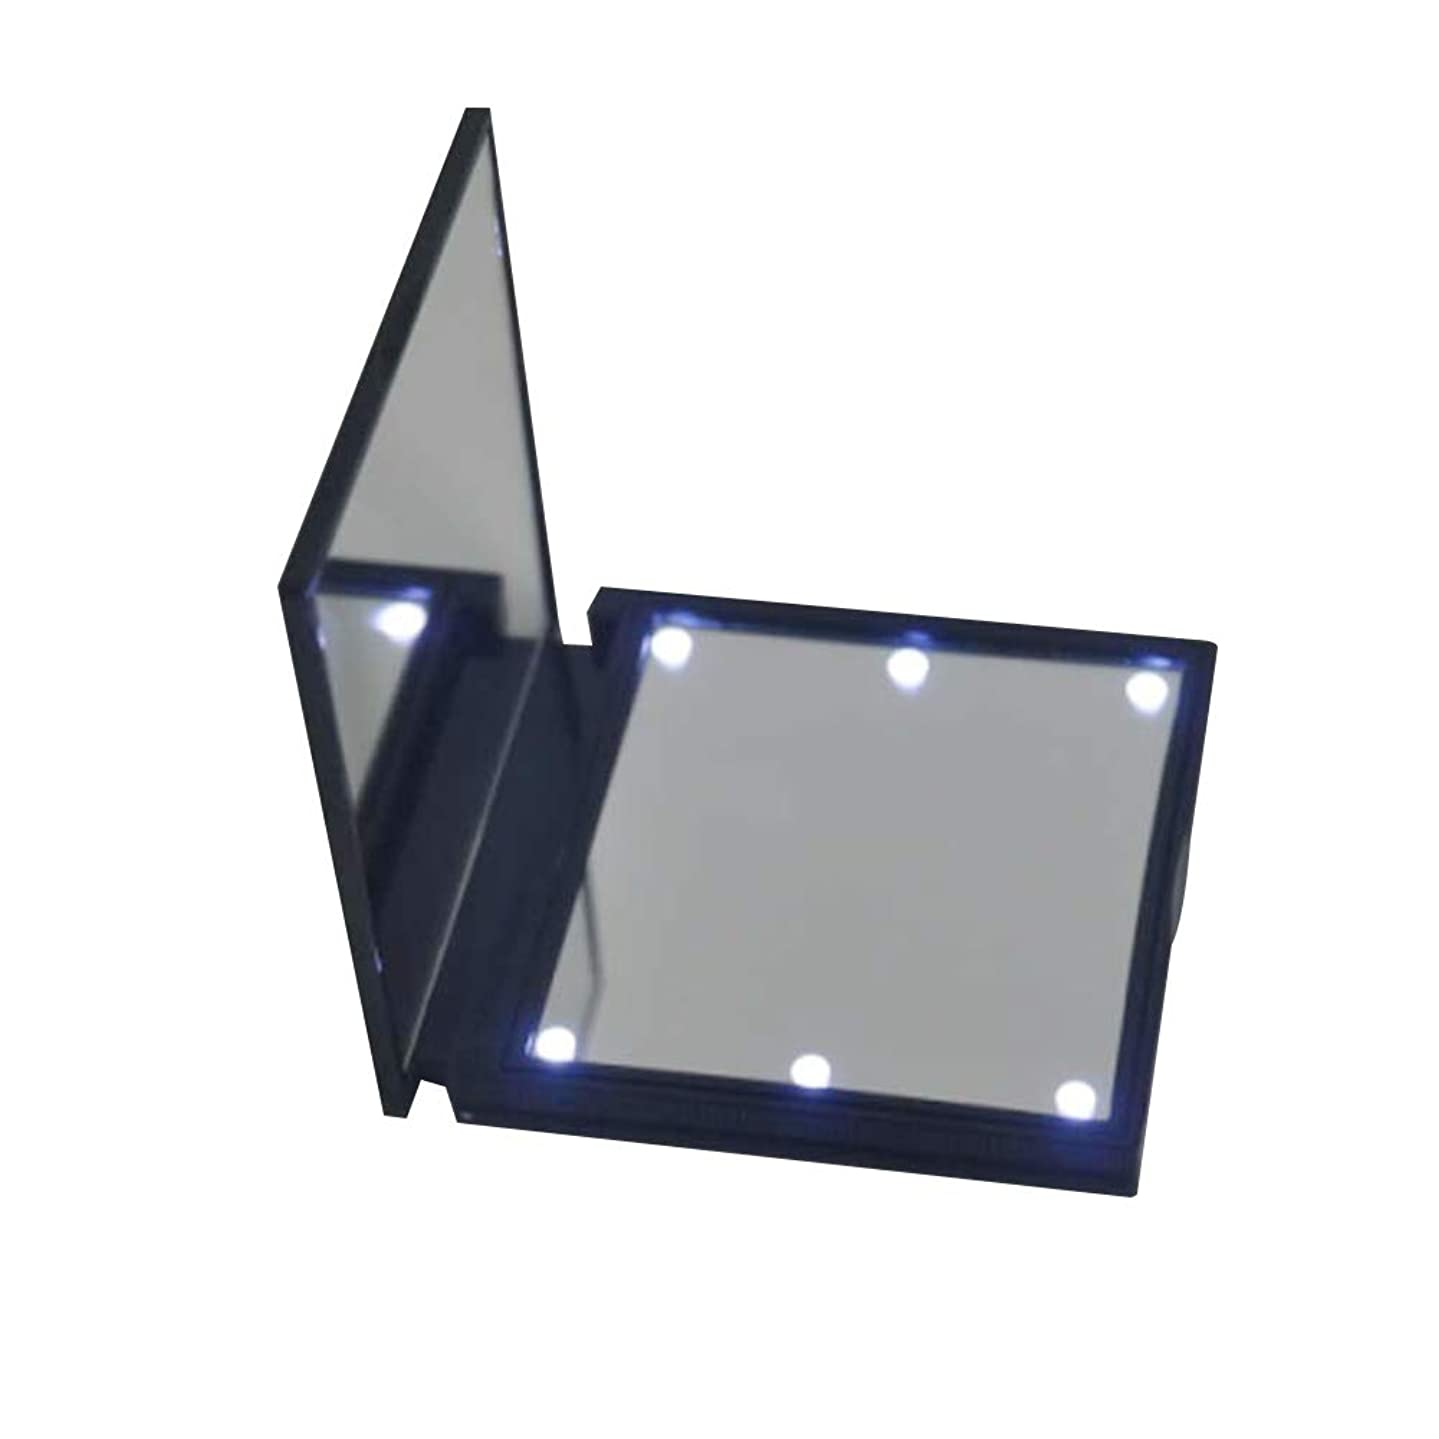 Mirror gLoaSublim Mini Portable Foldable 180 Degree Rotating Makeup Cosmetic Mirror with LED Light - Black